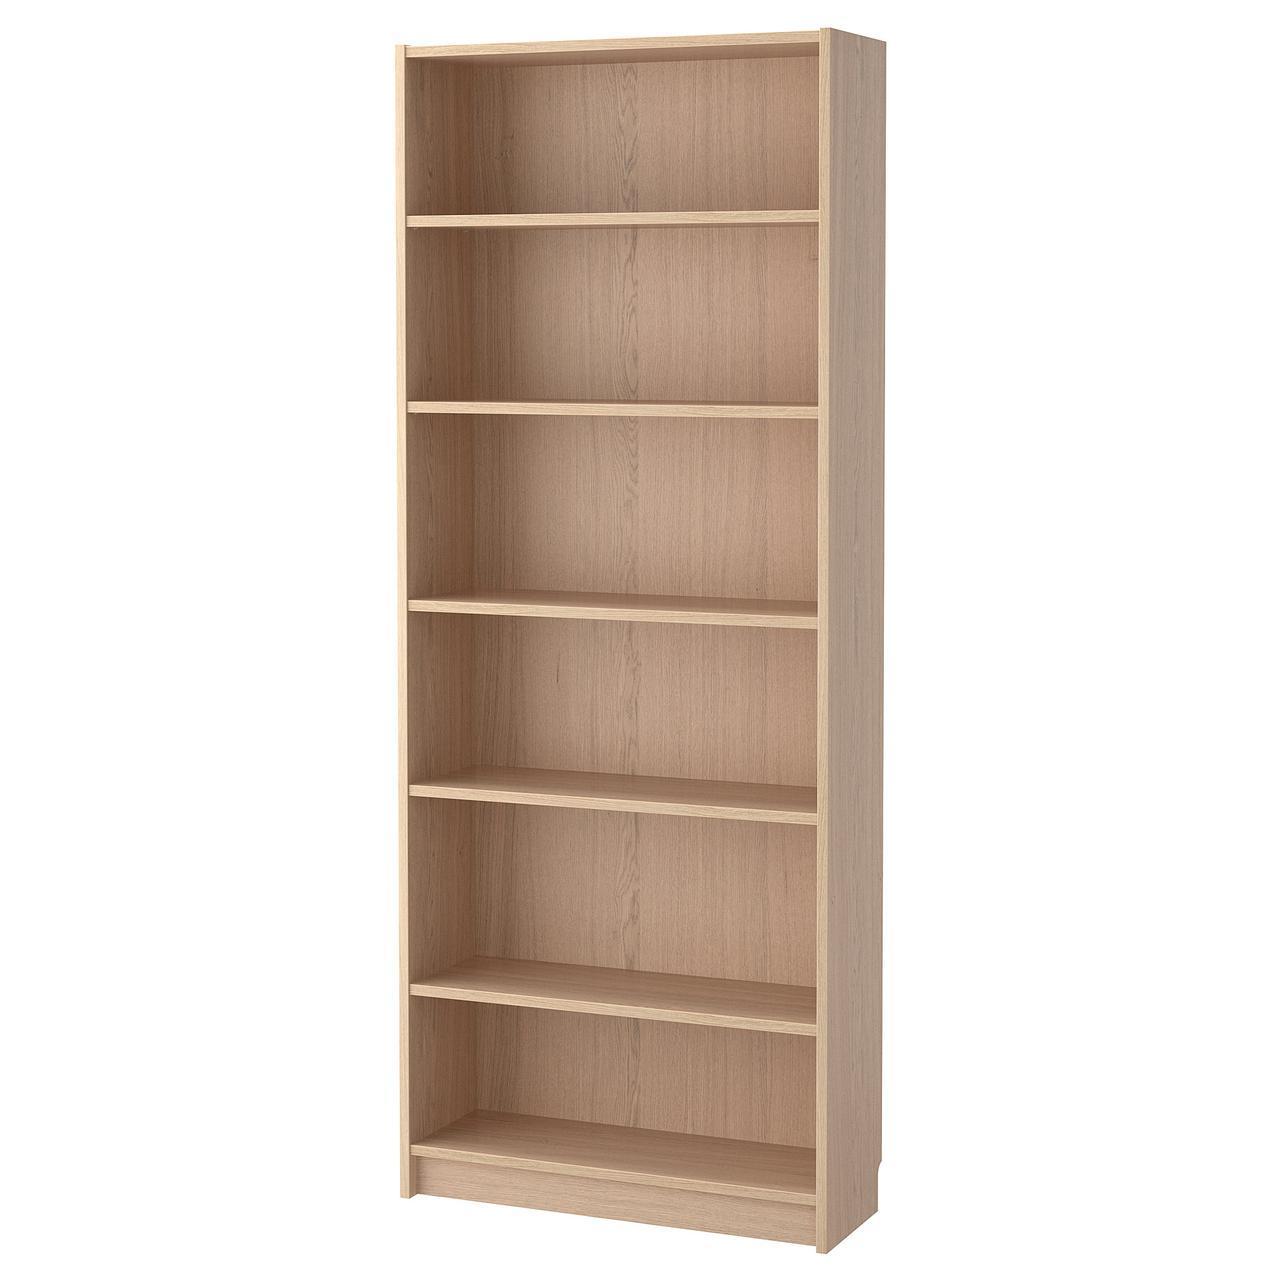 ✅ IKEA BILLY (904.042.09) Шкаф, белый